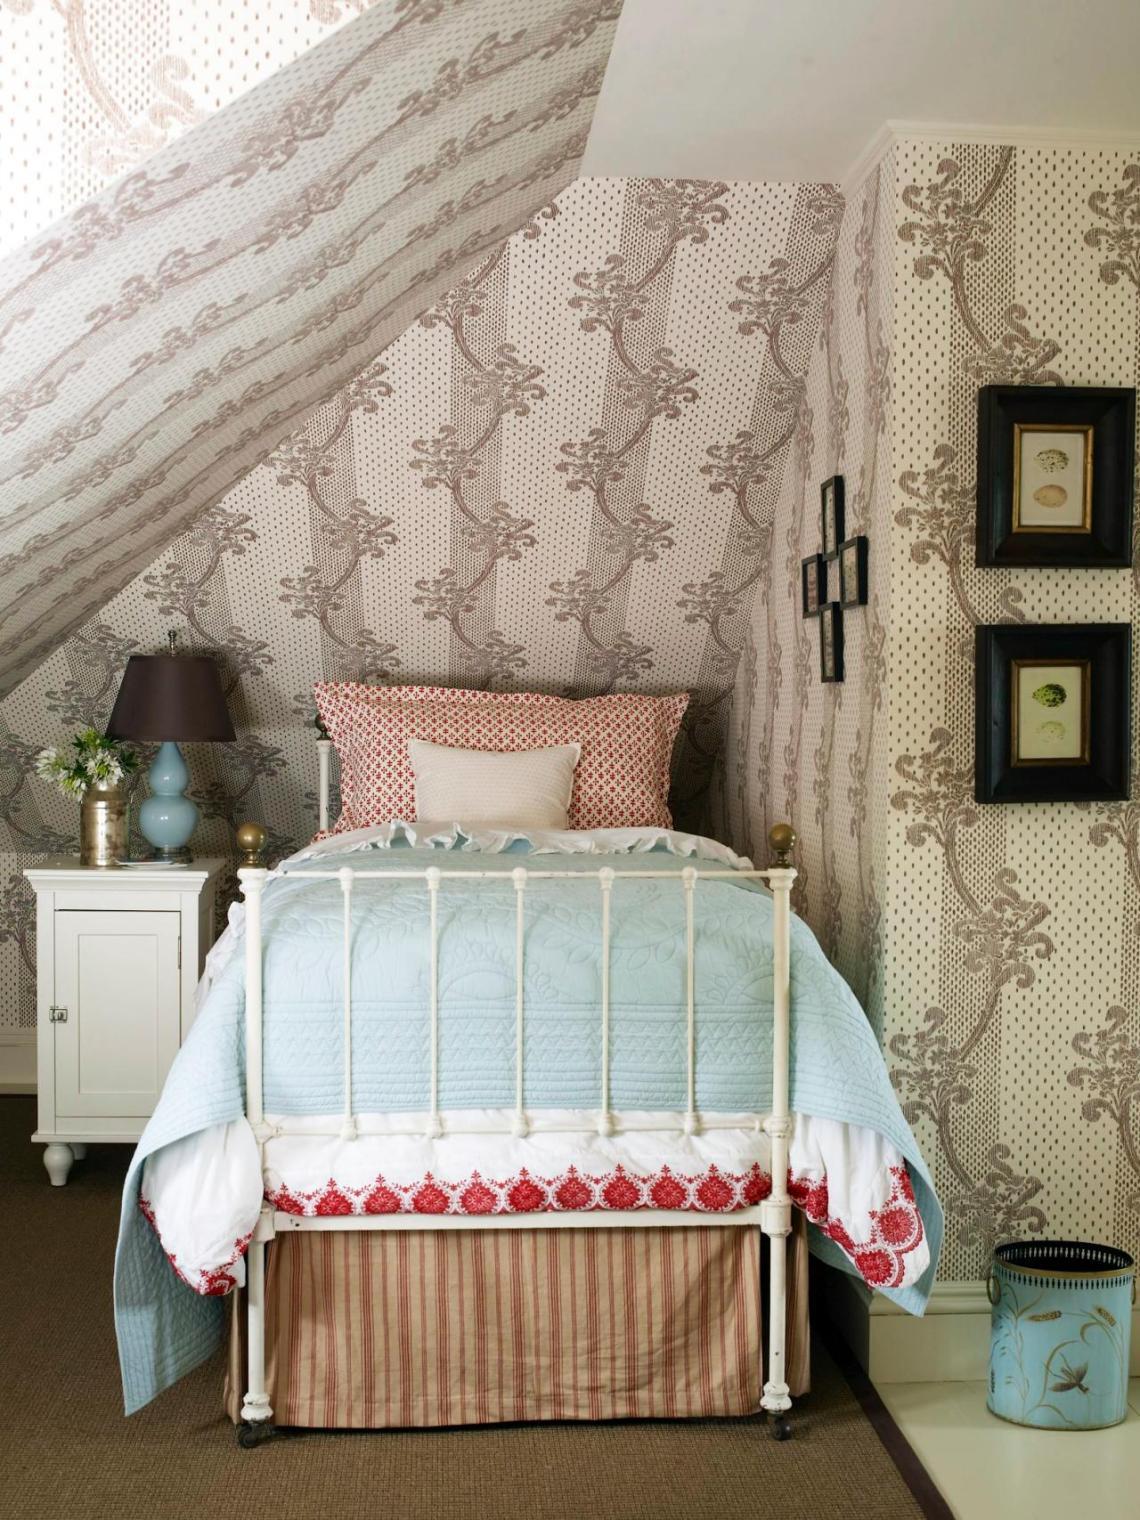 25 Shabby-Chic Style Bedroom Design Ideas - Decoration Love